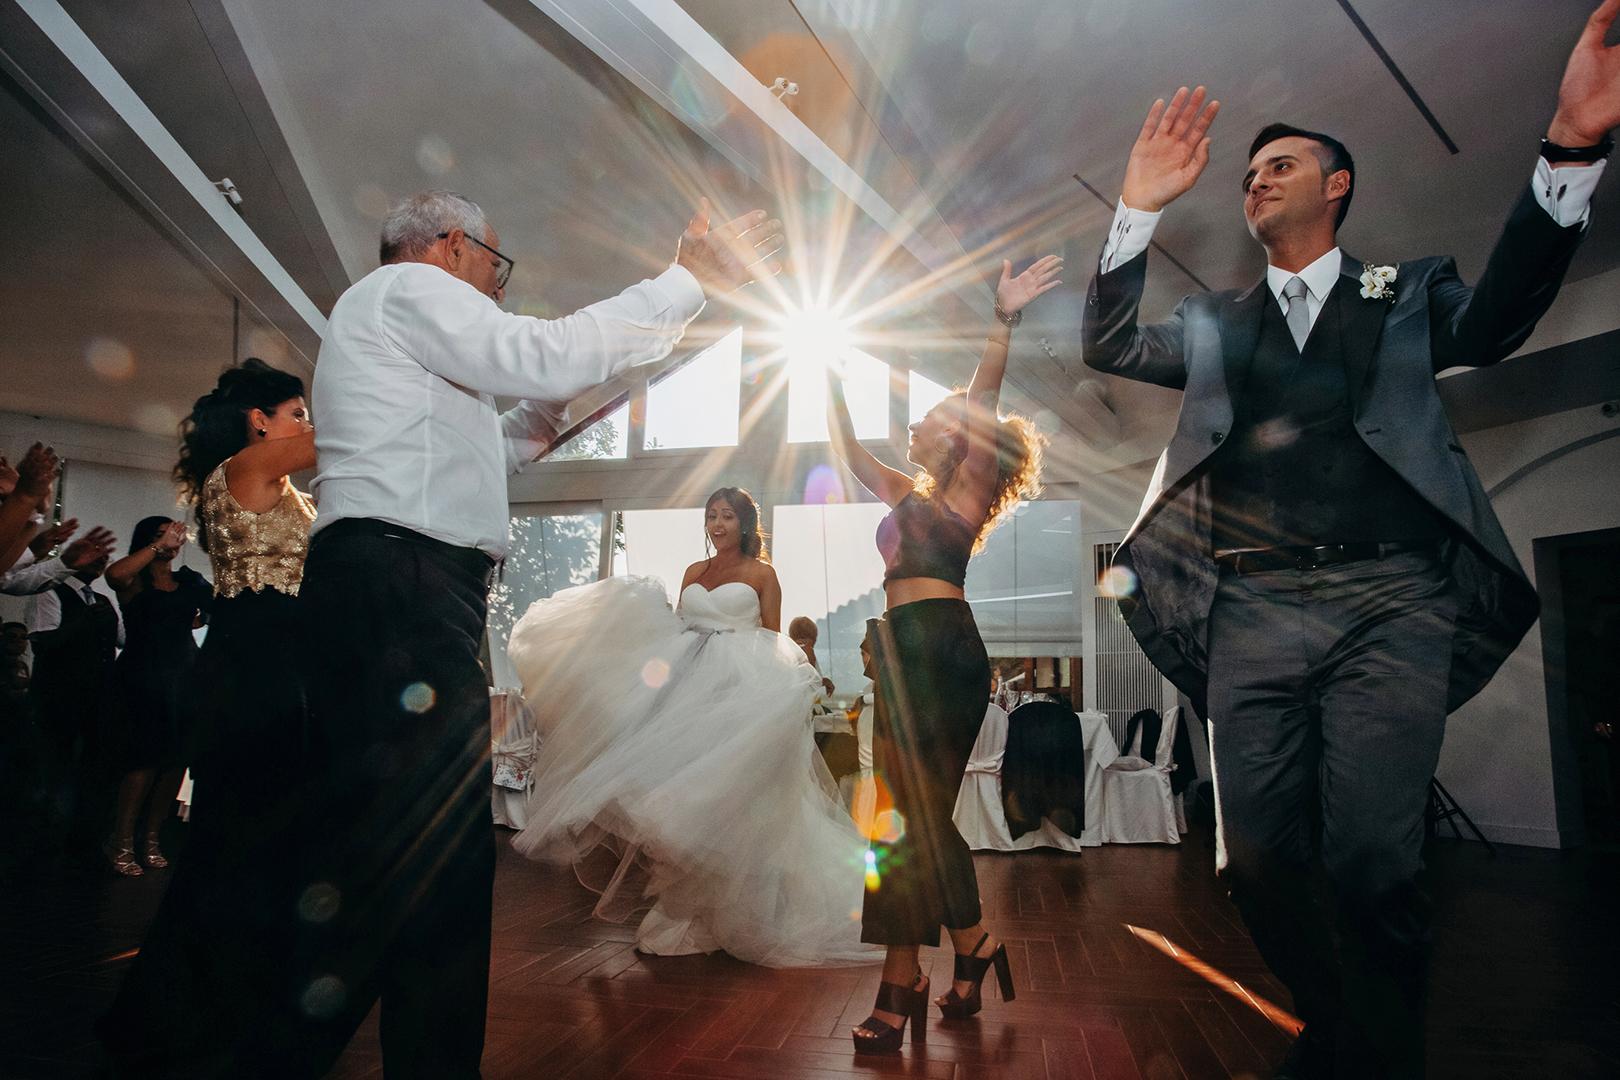 55 gianni-lepore-sposi-ballo-bride-groom-torre-andriana-foggia-sala